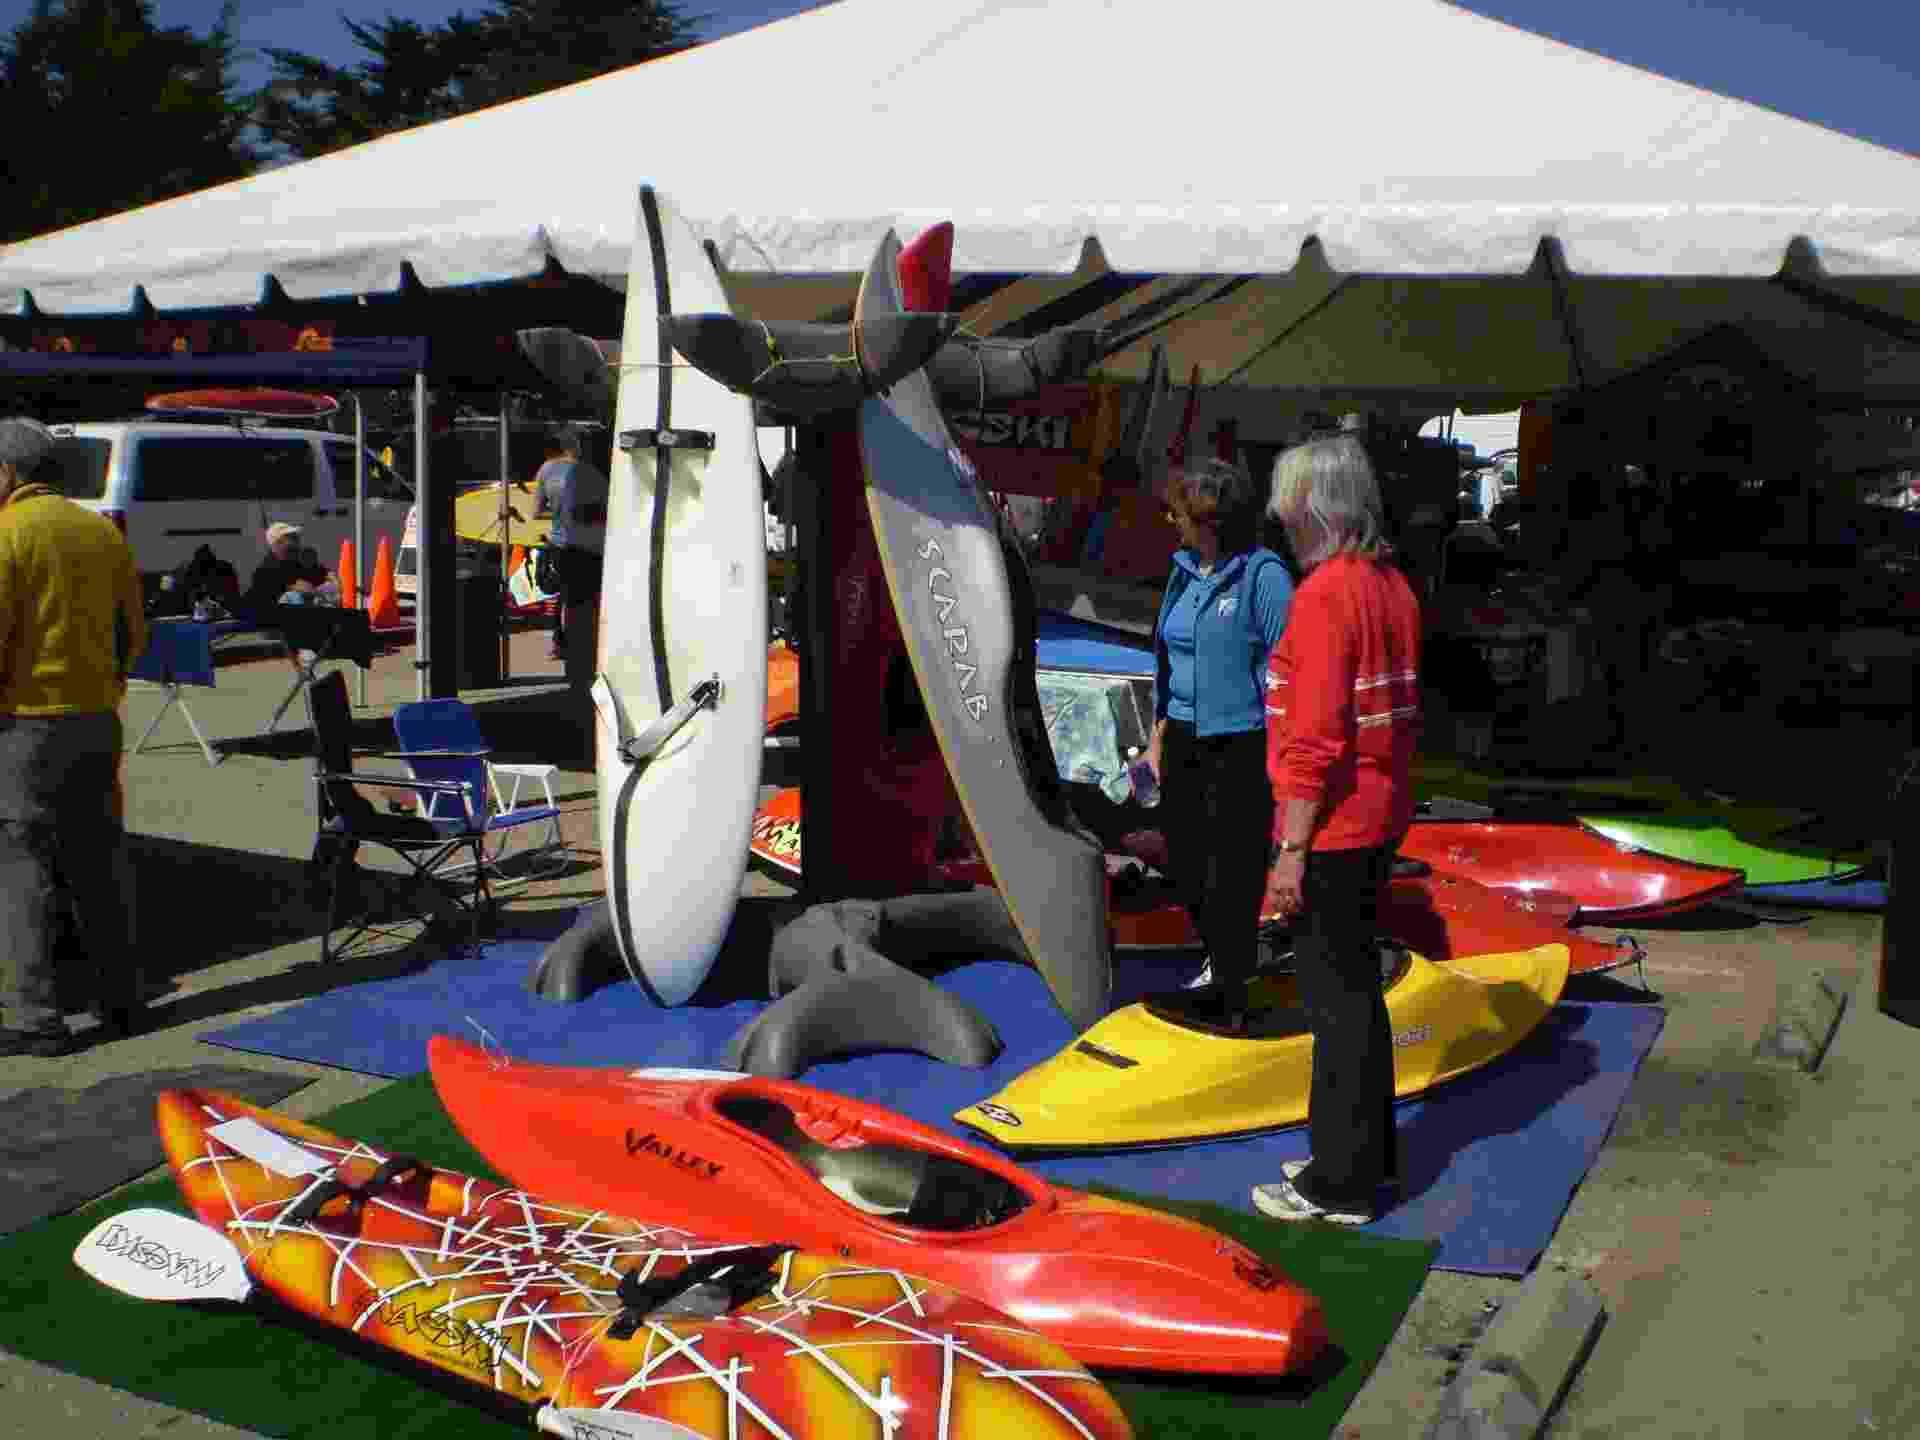 O evento também reúne expositores e representantes de diversas marcas de equipamentos - Roberta Borsari